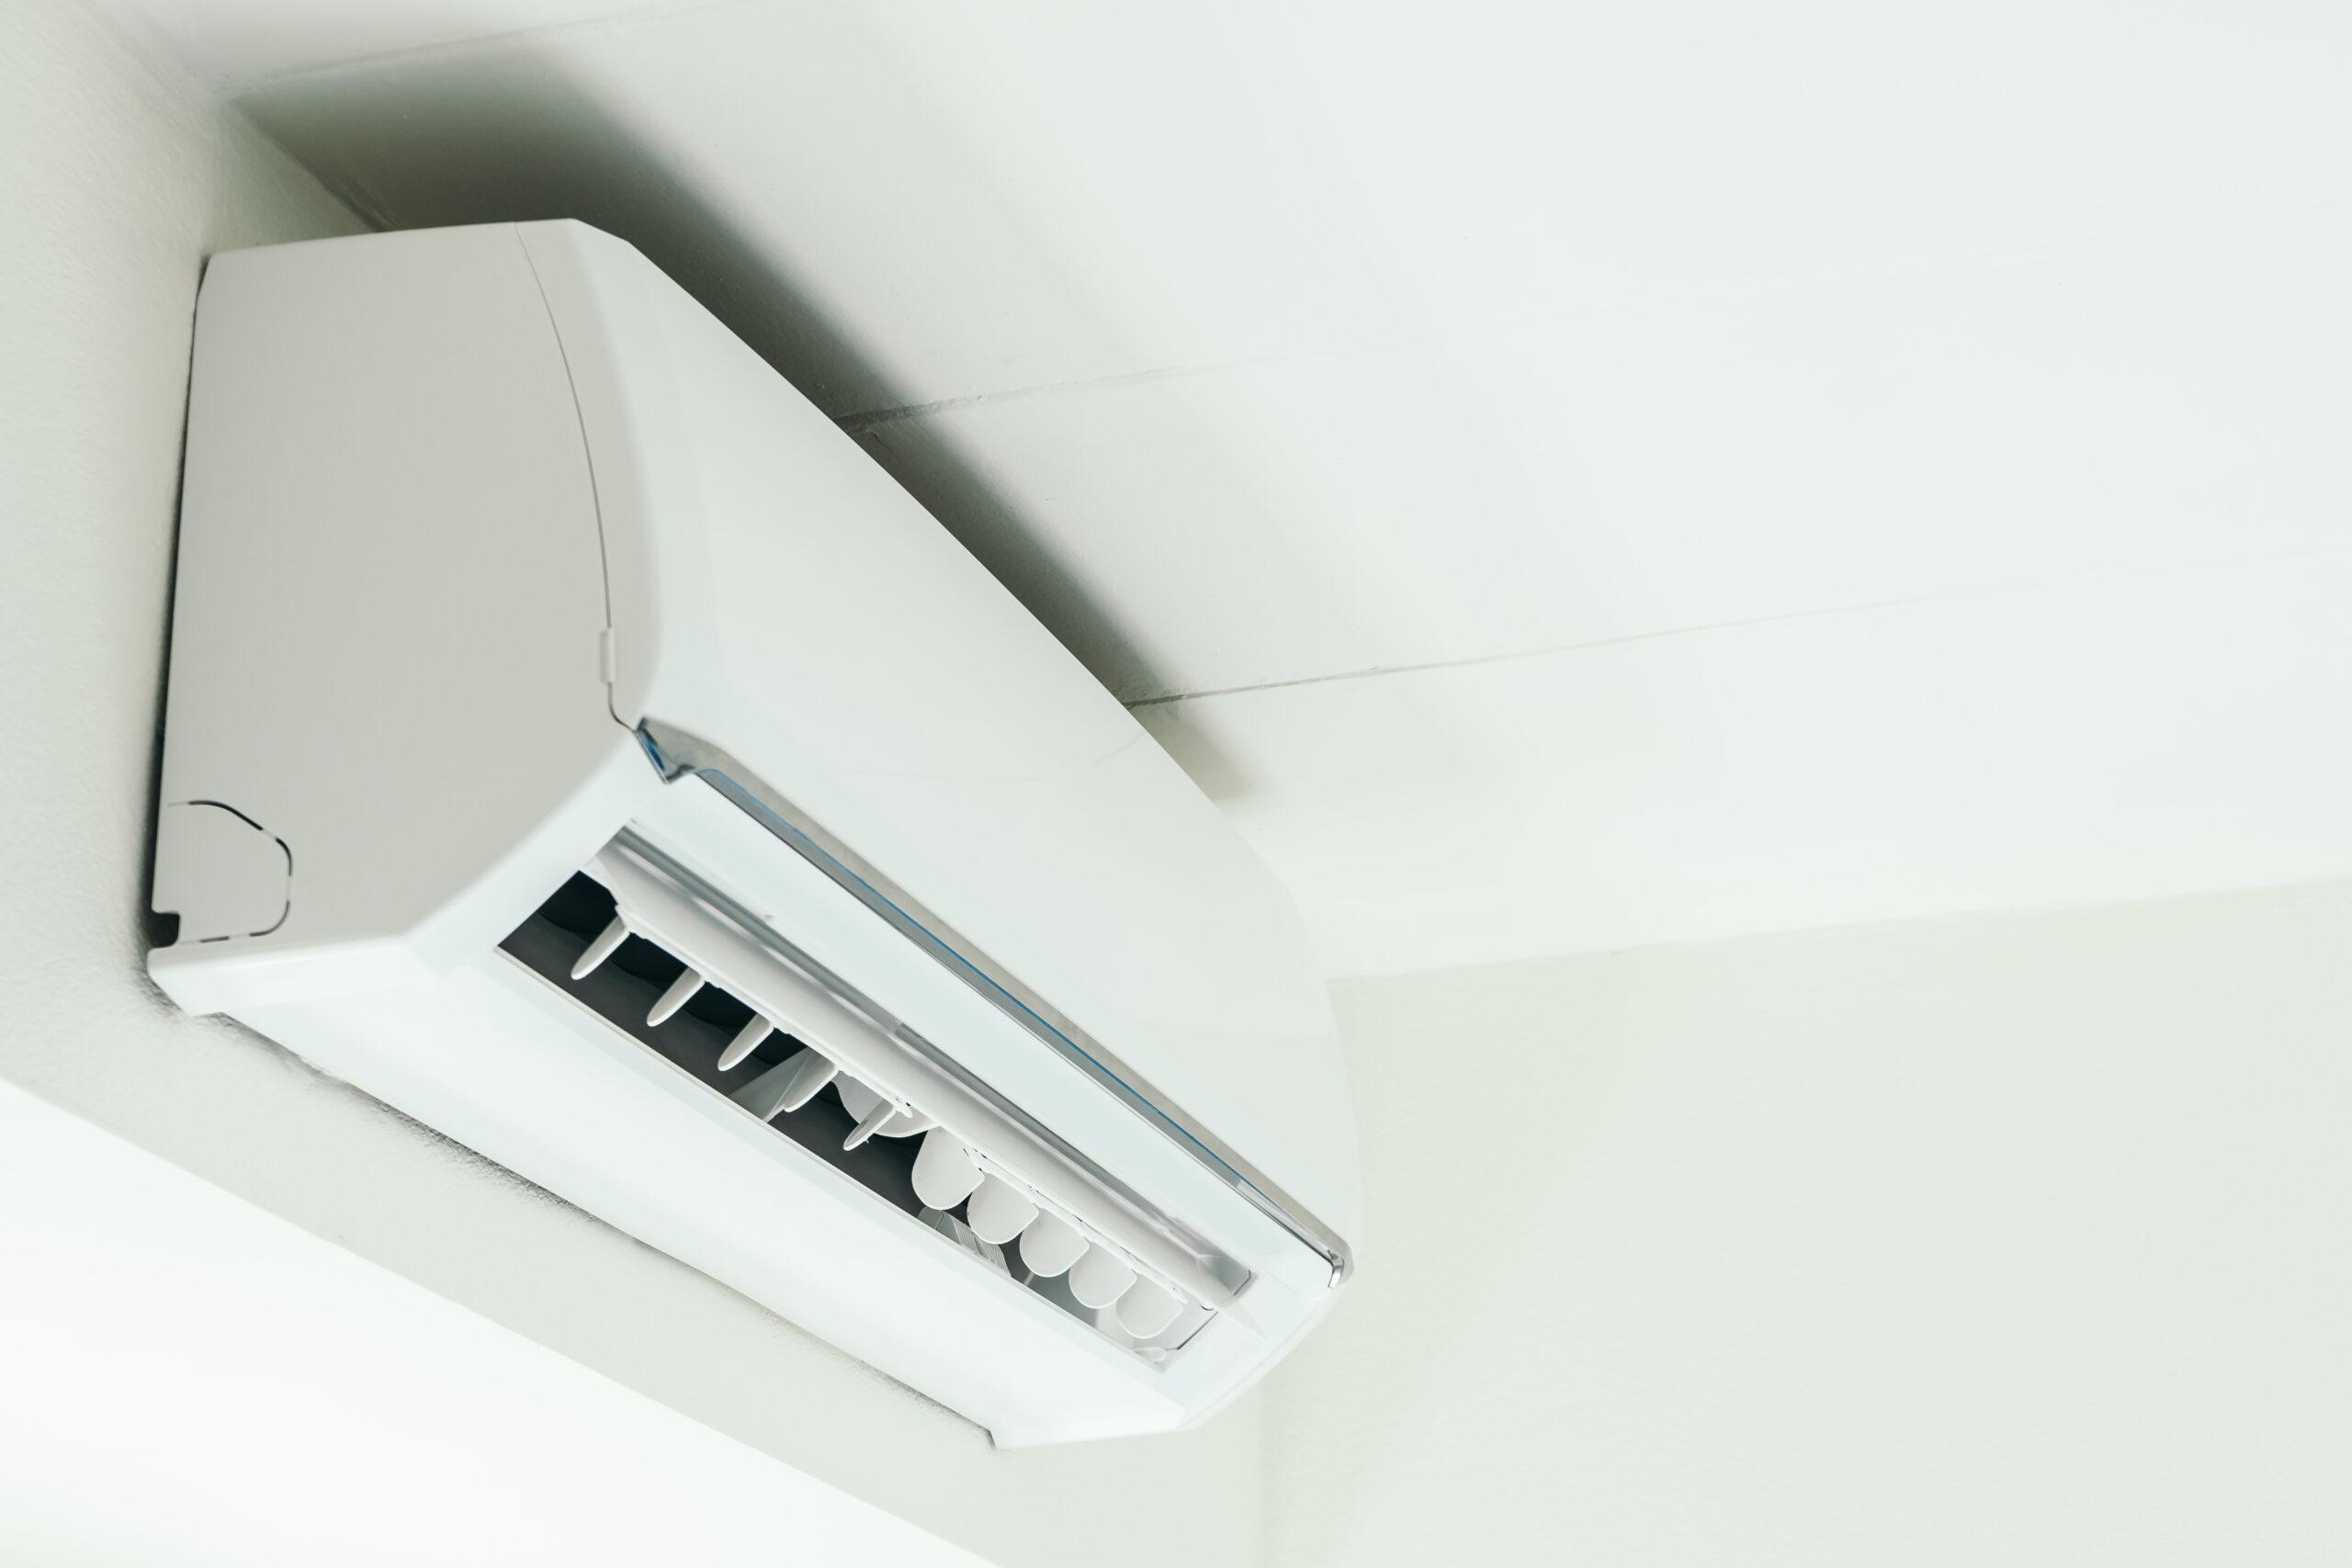 Luft til luft varmepumpe Guide: Trin for trin til den perfekte varmepumpe